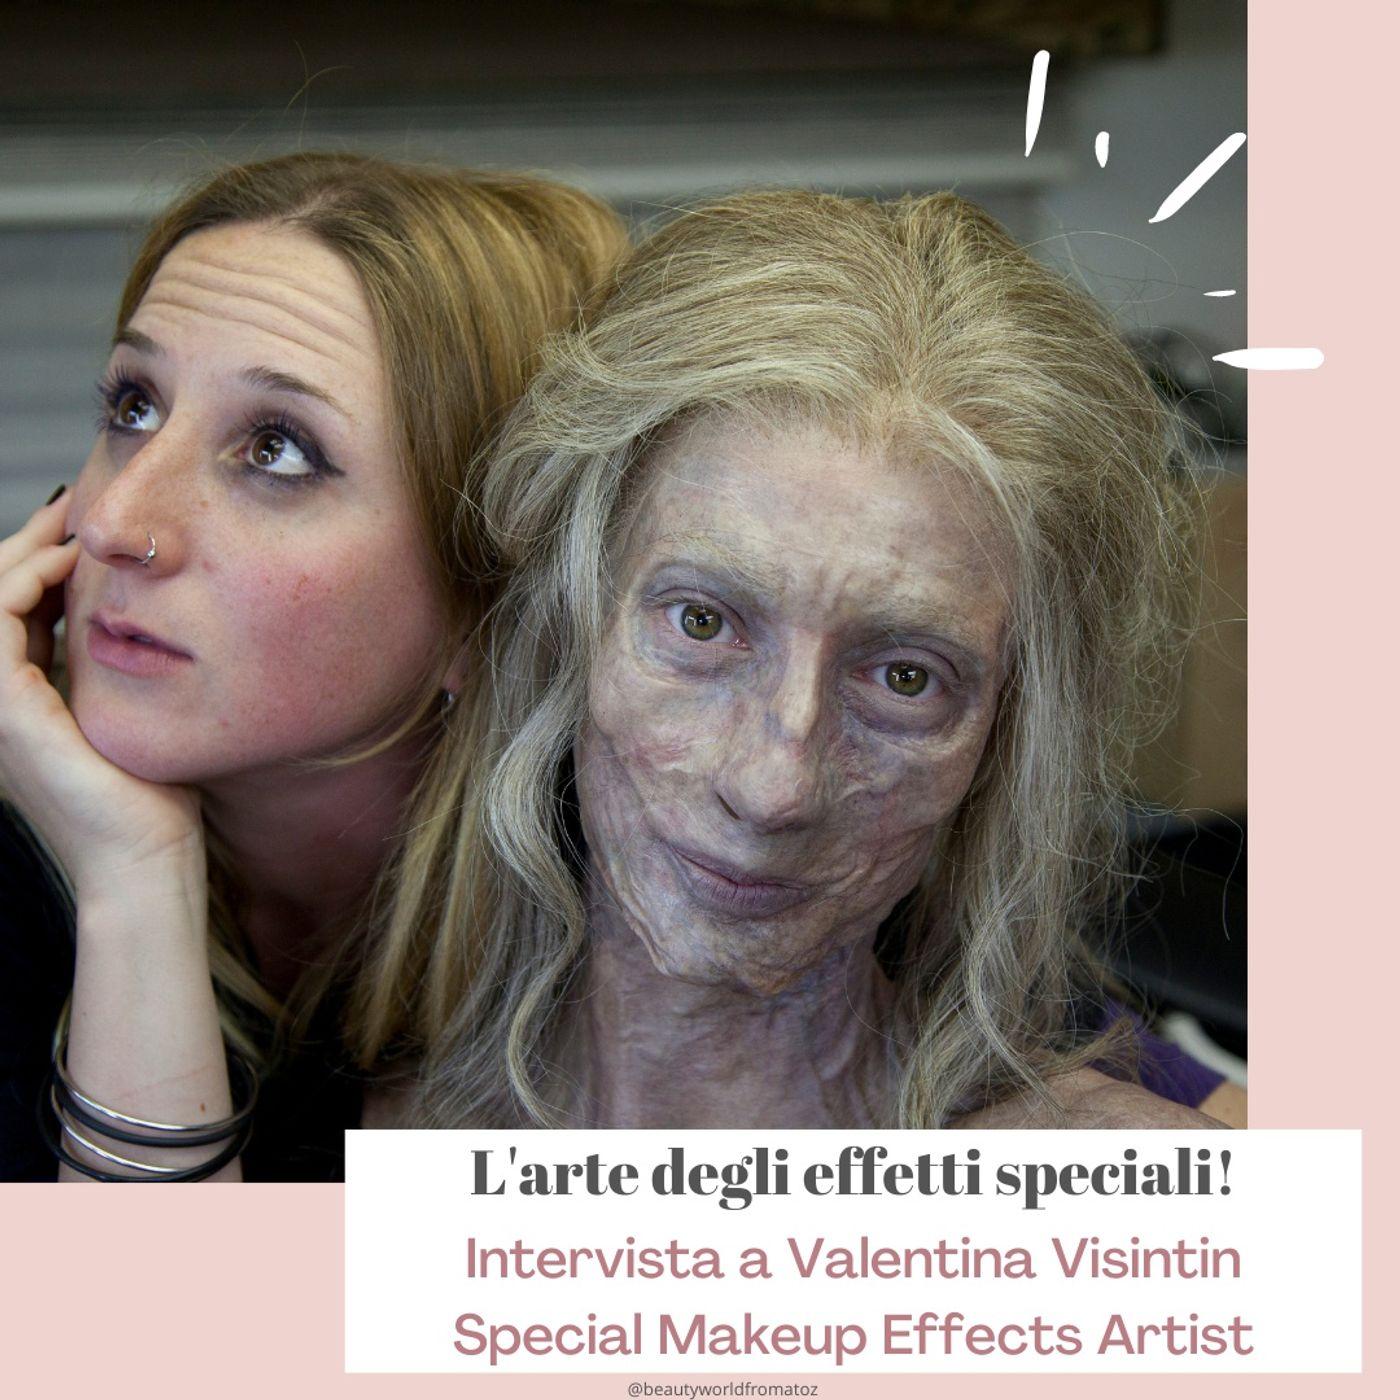 Ep. 30. L'arte degli Effetti Speciali - Intervista a Valentina Visintin, Special Makeup Effects Artist